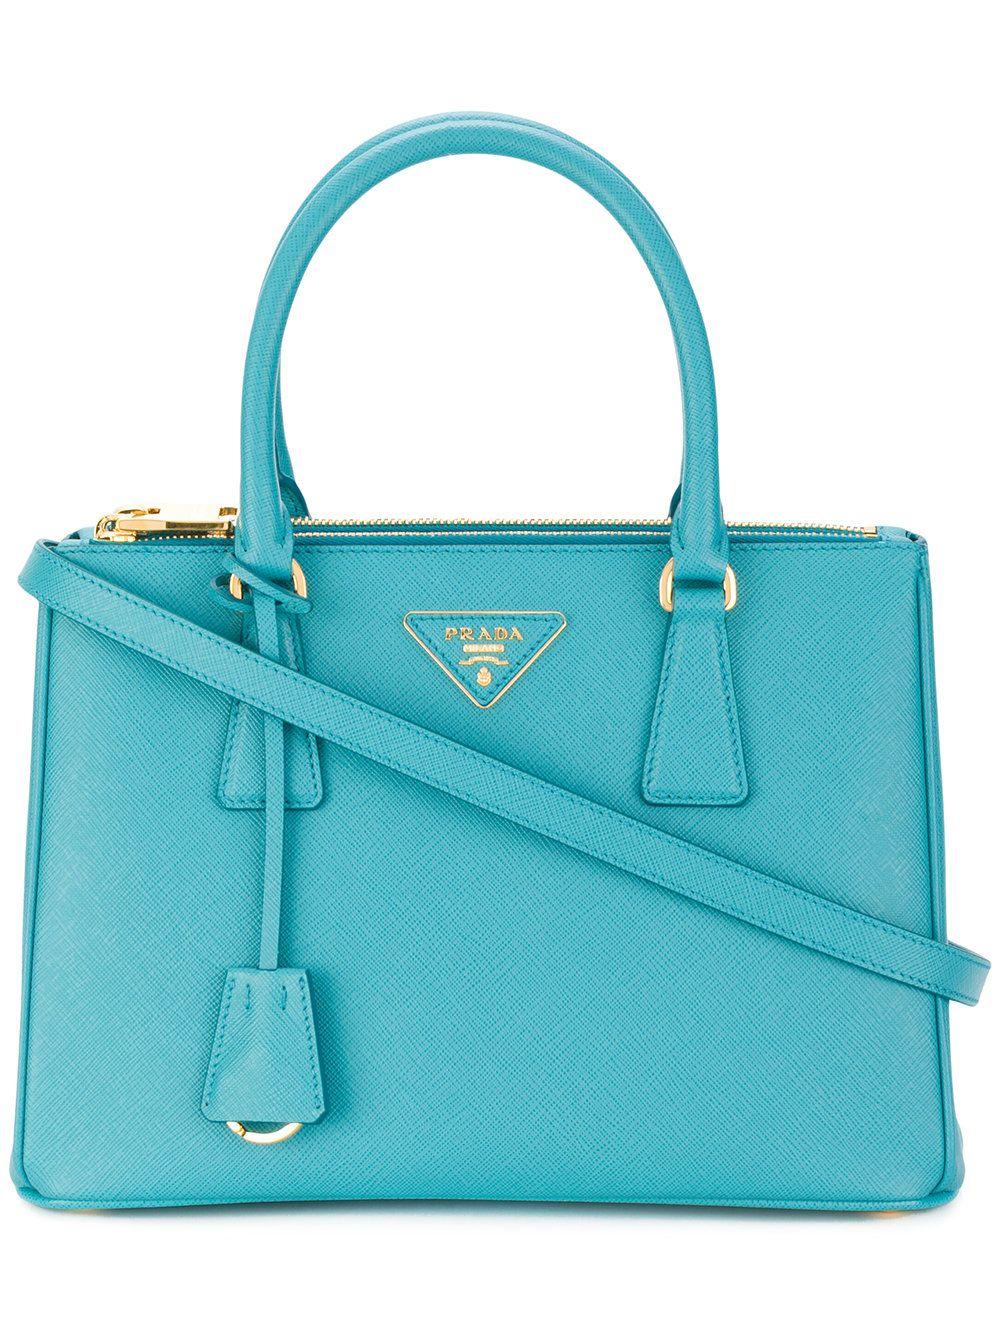 8f21a6aba13c Prada Galleria medium tote | Purses and Wallets | Medium tote, Prada ...